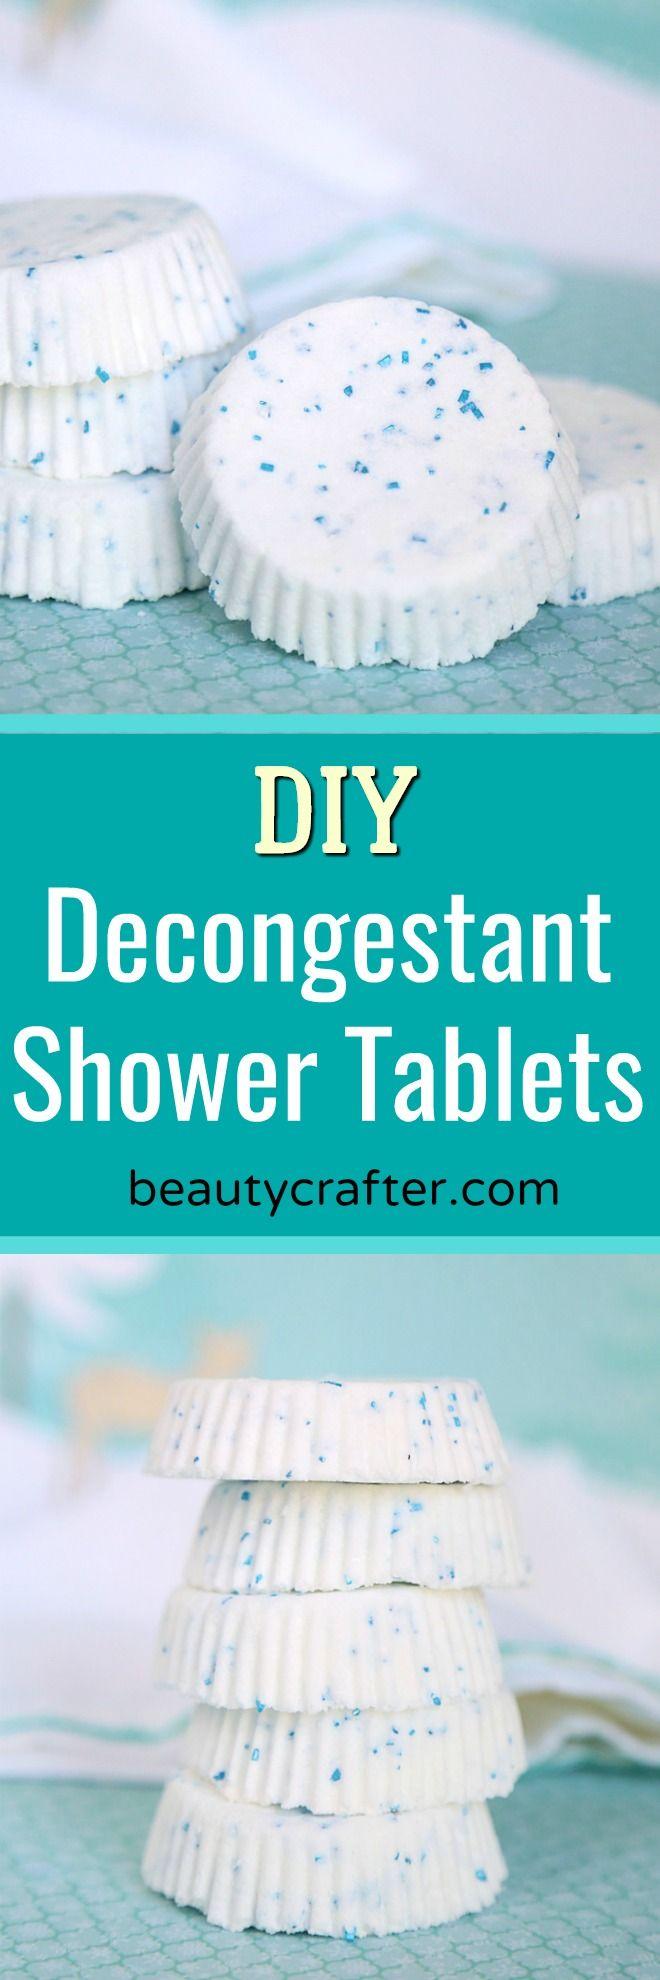 Diy Decongestant Shower Tablets Recipe Homemade Shower